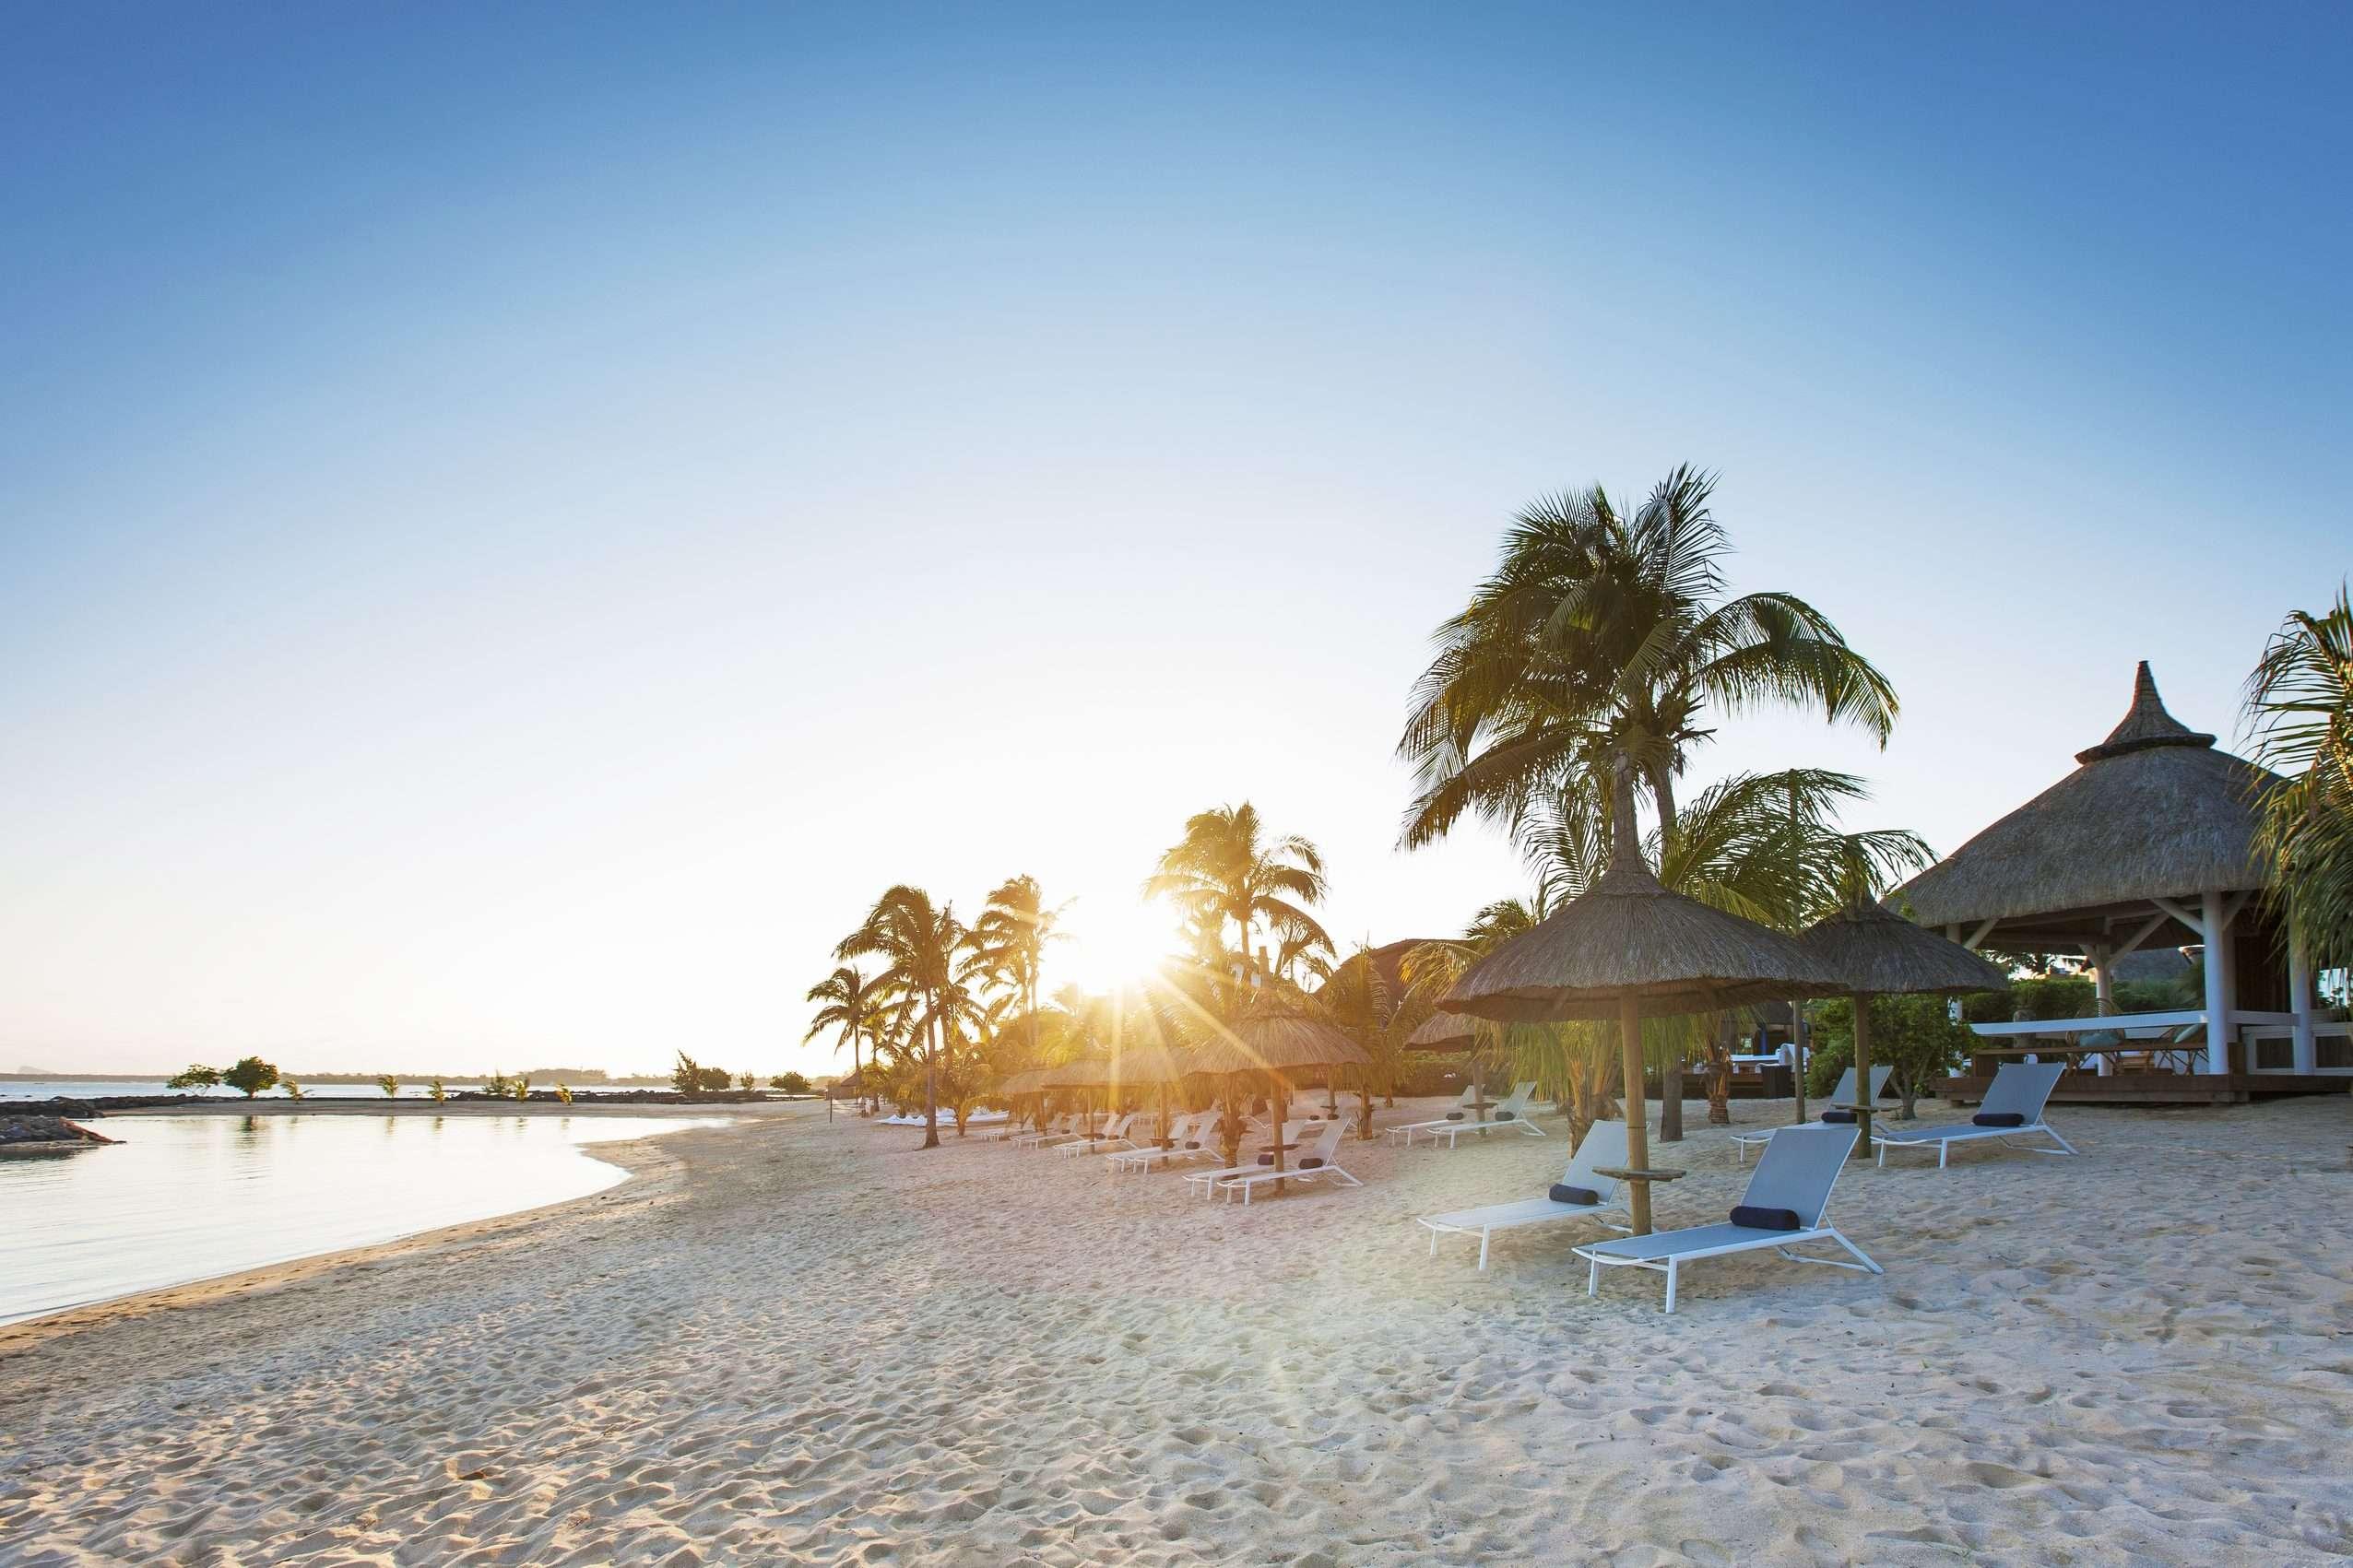 Veranda Pointe Aux Biches Hotel, Flacq District, Mauritius